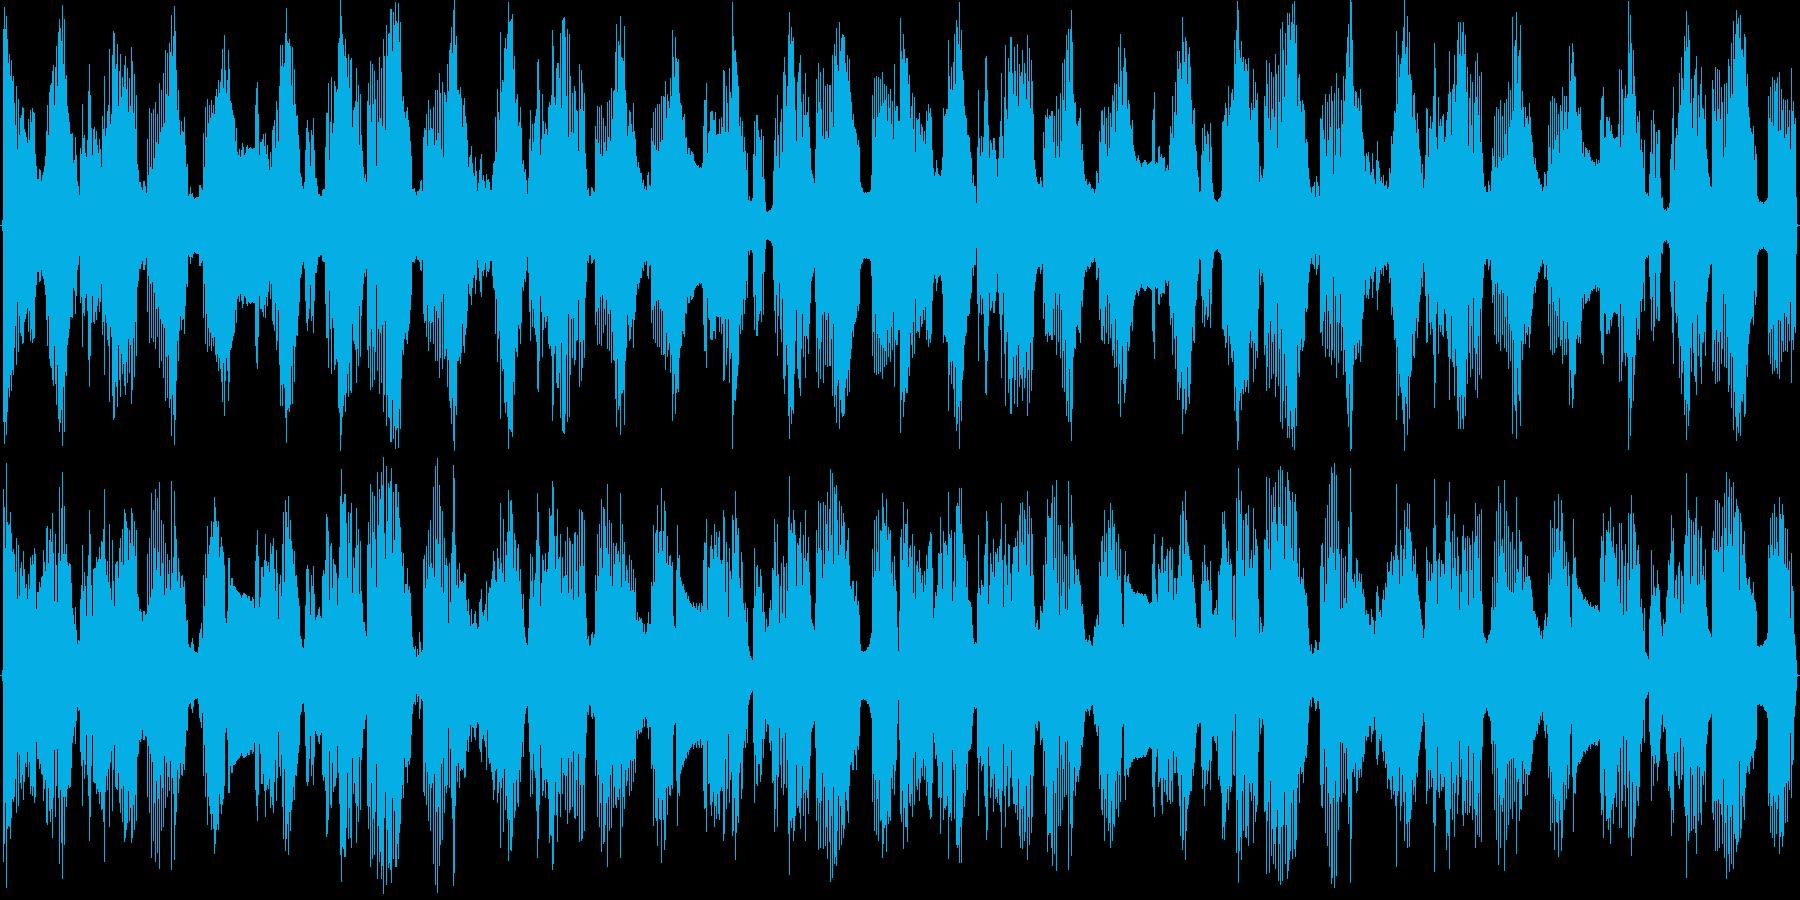 ~Reset - ここから再開しよう~の再生済みの波形